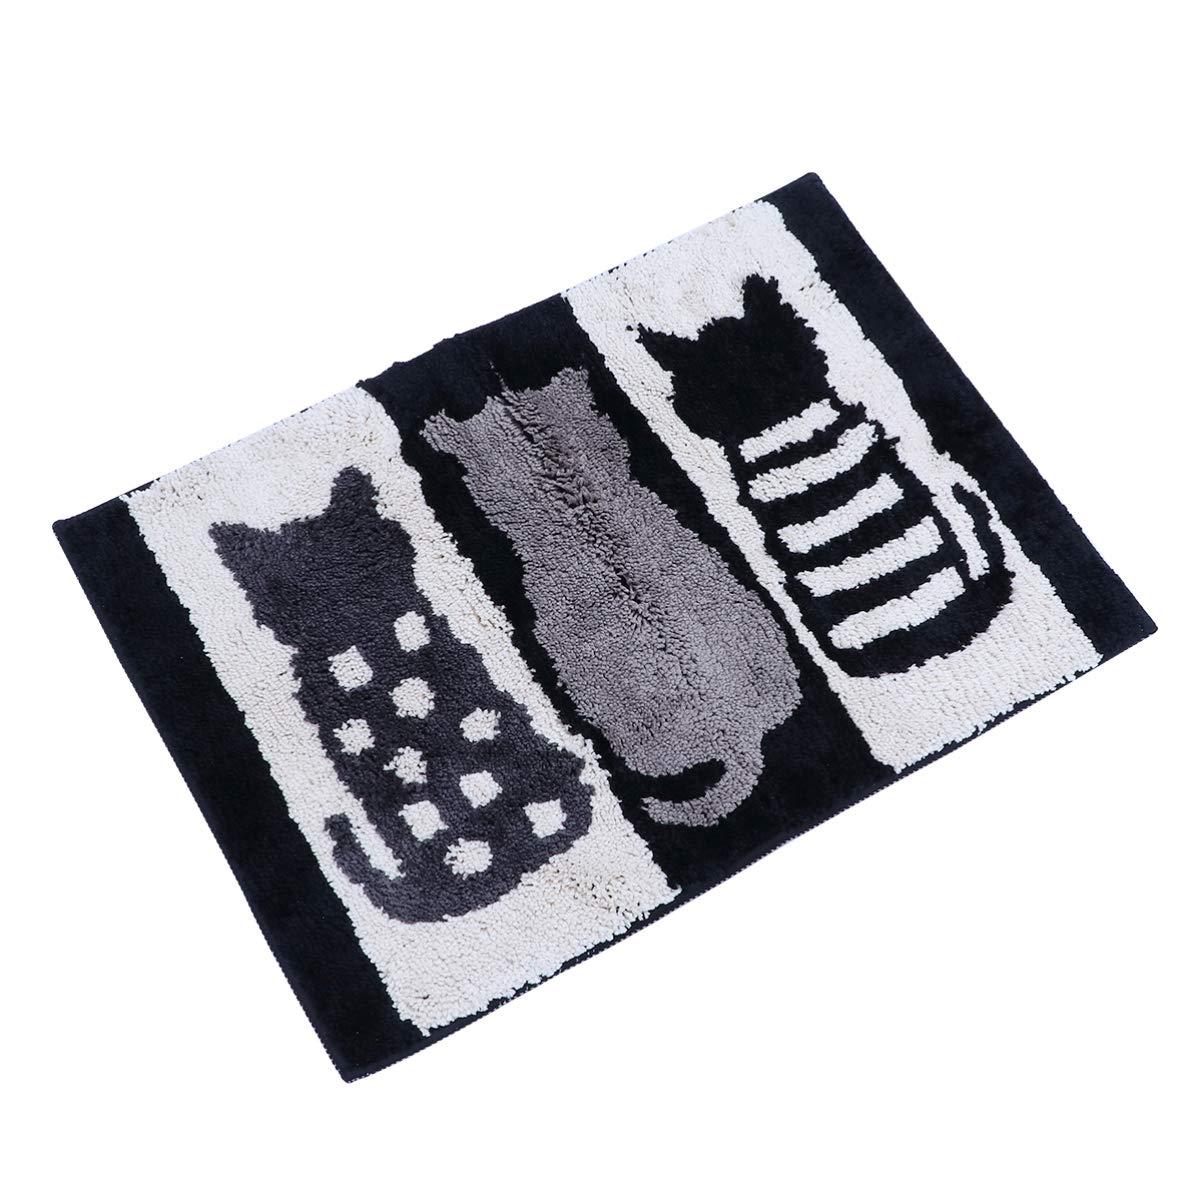 Vosarea Door Mat Water Absorption Cat Non-slip Cute Flocking Footpad Household Mat for Bathroom Bedroom Kitchen